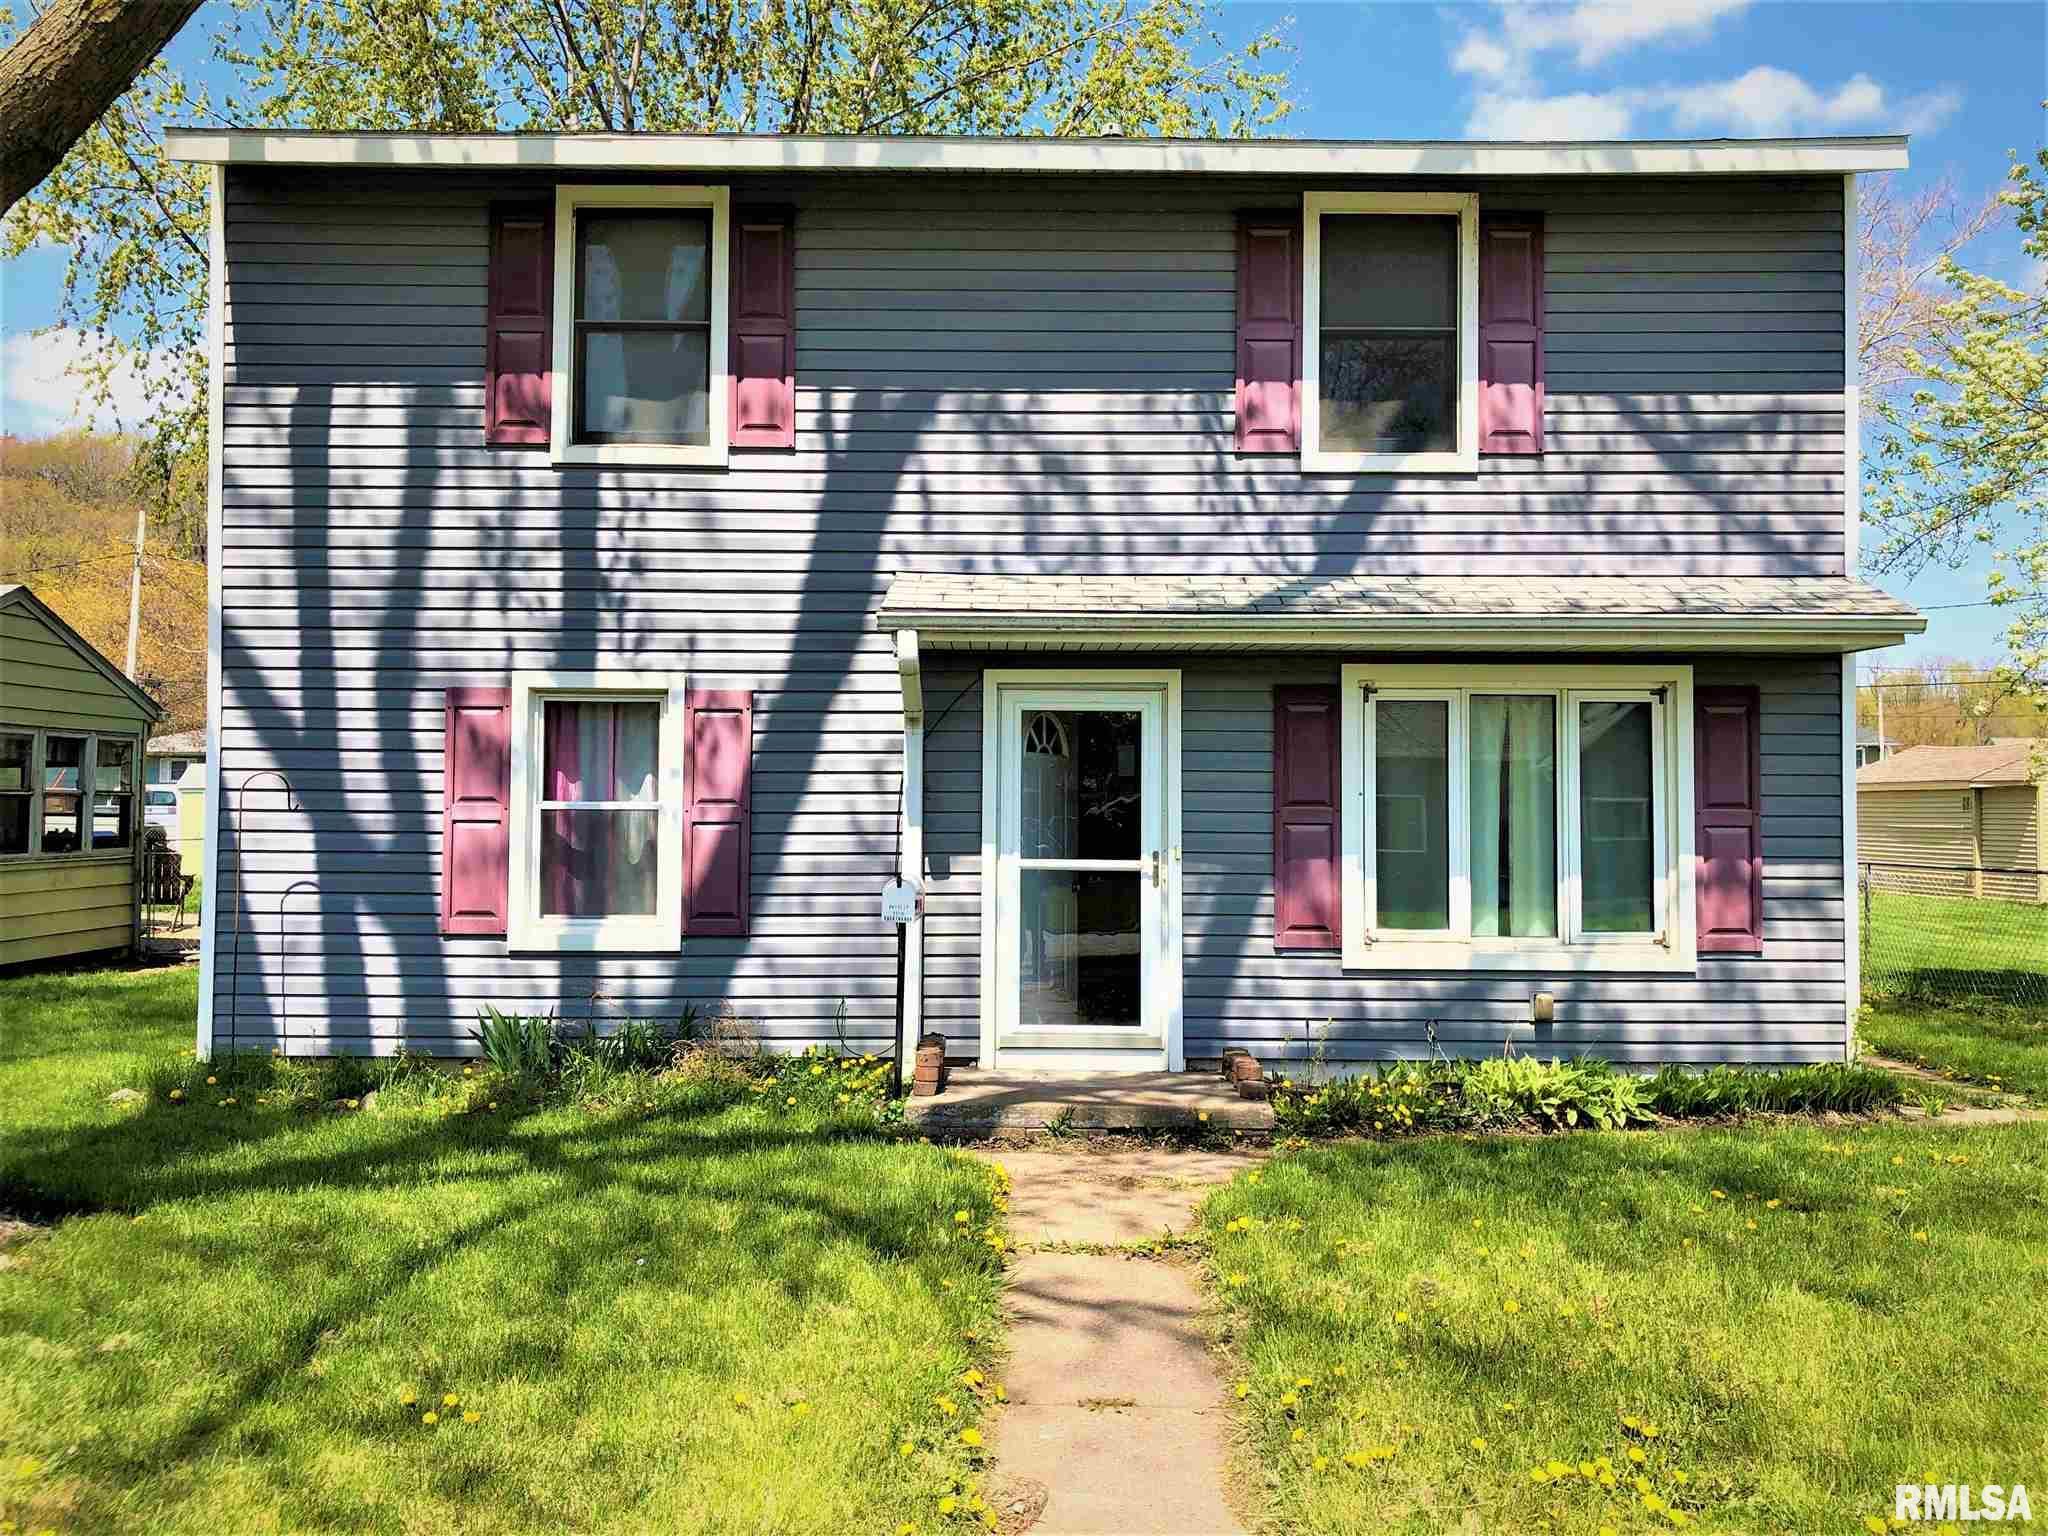 3810 ROCKINGHAM Property Photo - Davenport, IA real estate listing